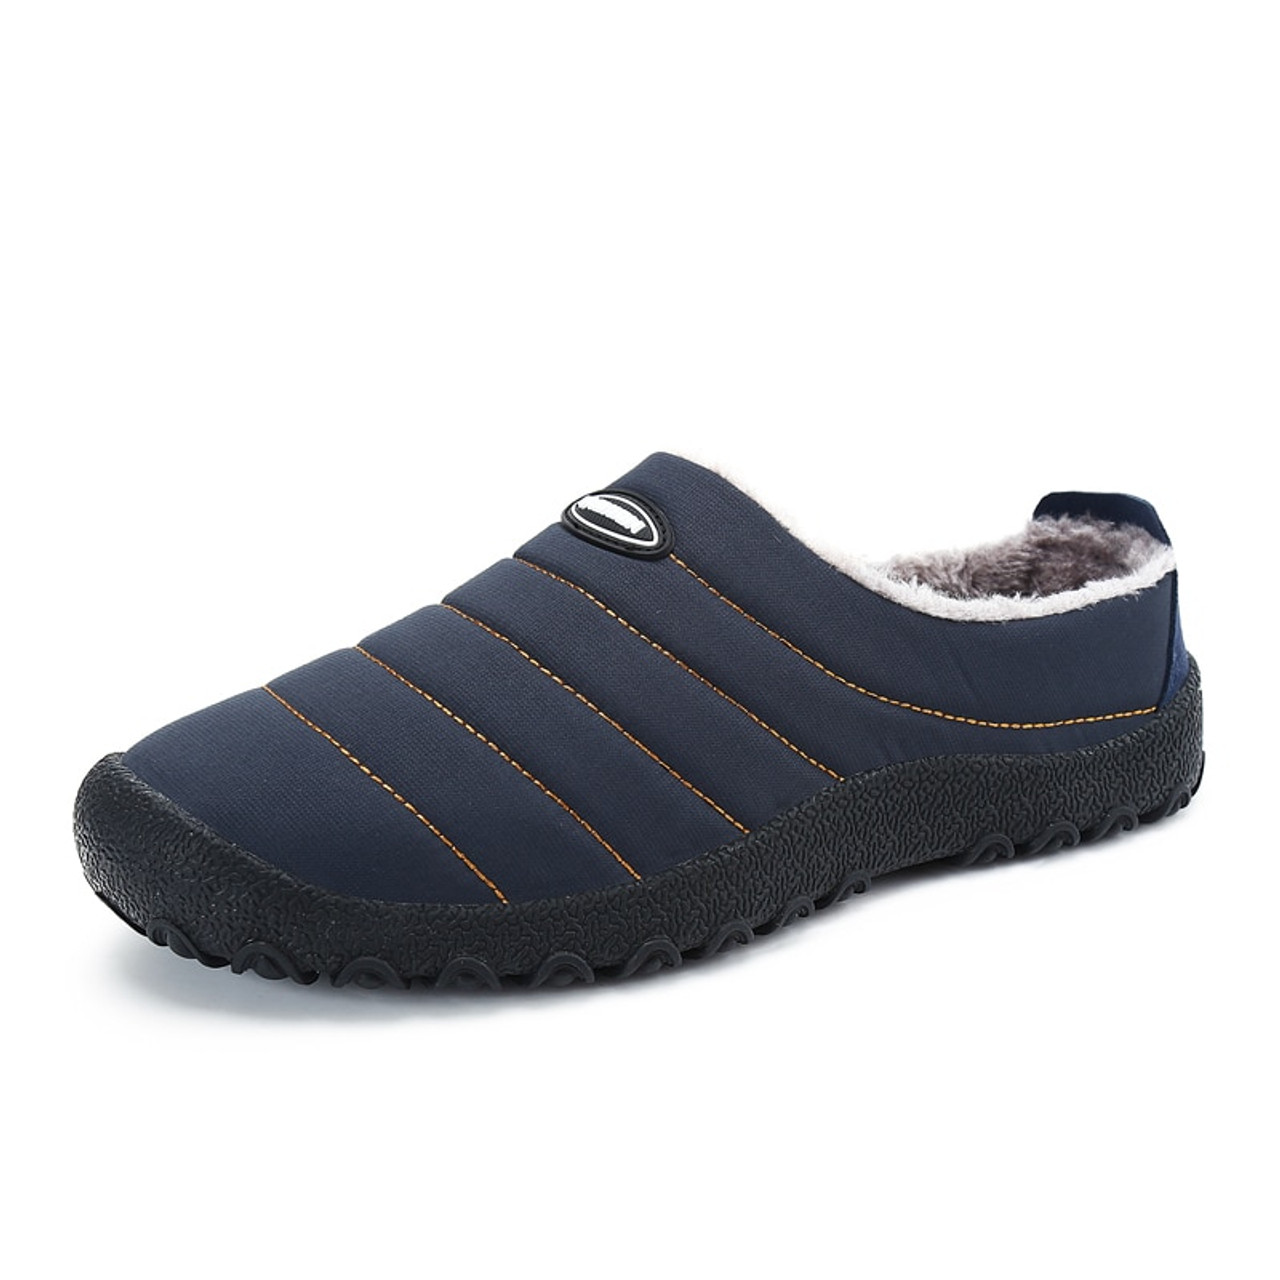 b14ed46fcd57 Christmas Winter Men Shoes Warm Plush Home Slippers Men Flip Flops Indoor Slippers  Waterproof Outdoor Shoes ...